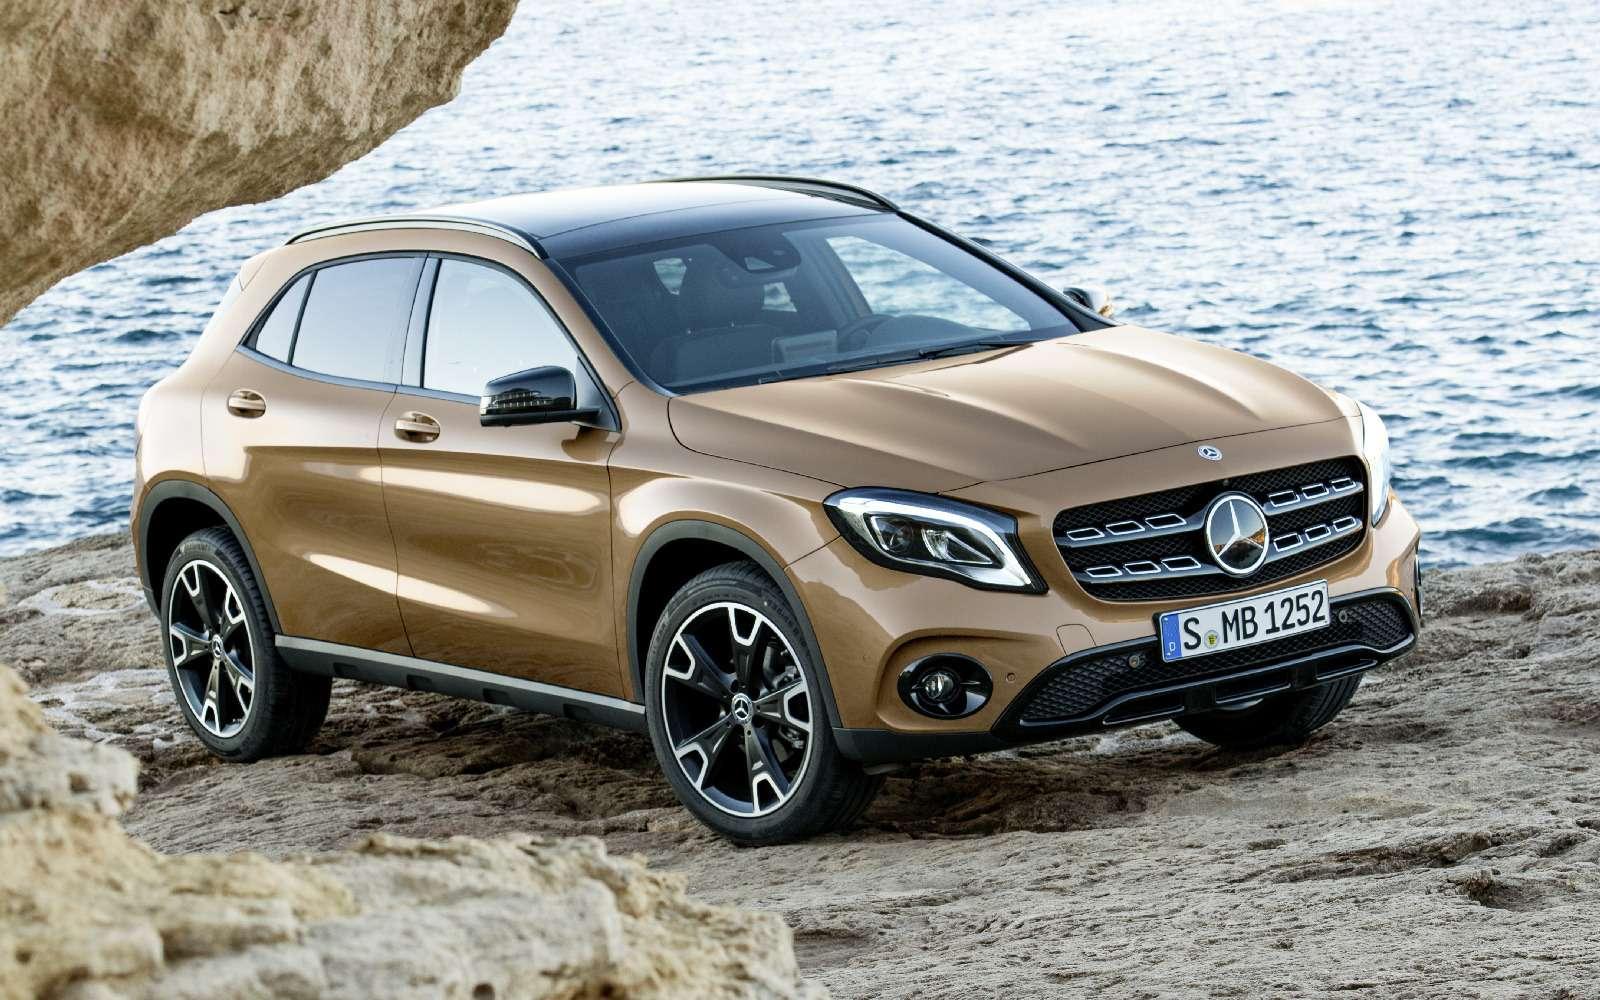 Mercedes-Benz GLA стал краше, ноне просторнее— фото 690073